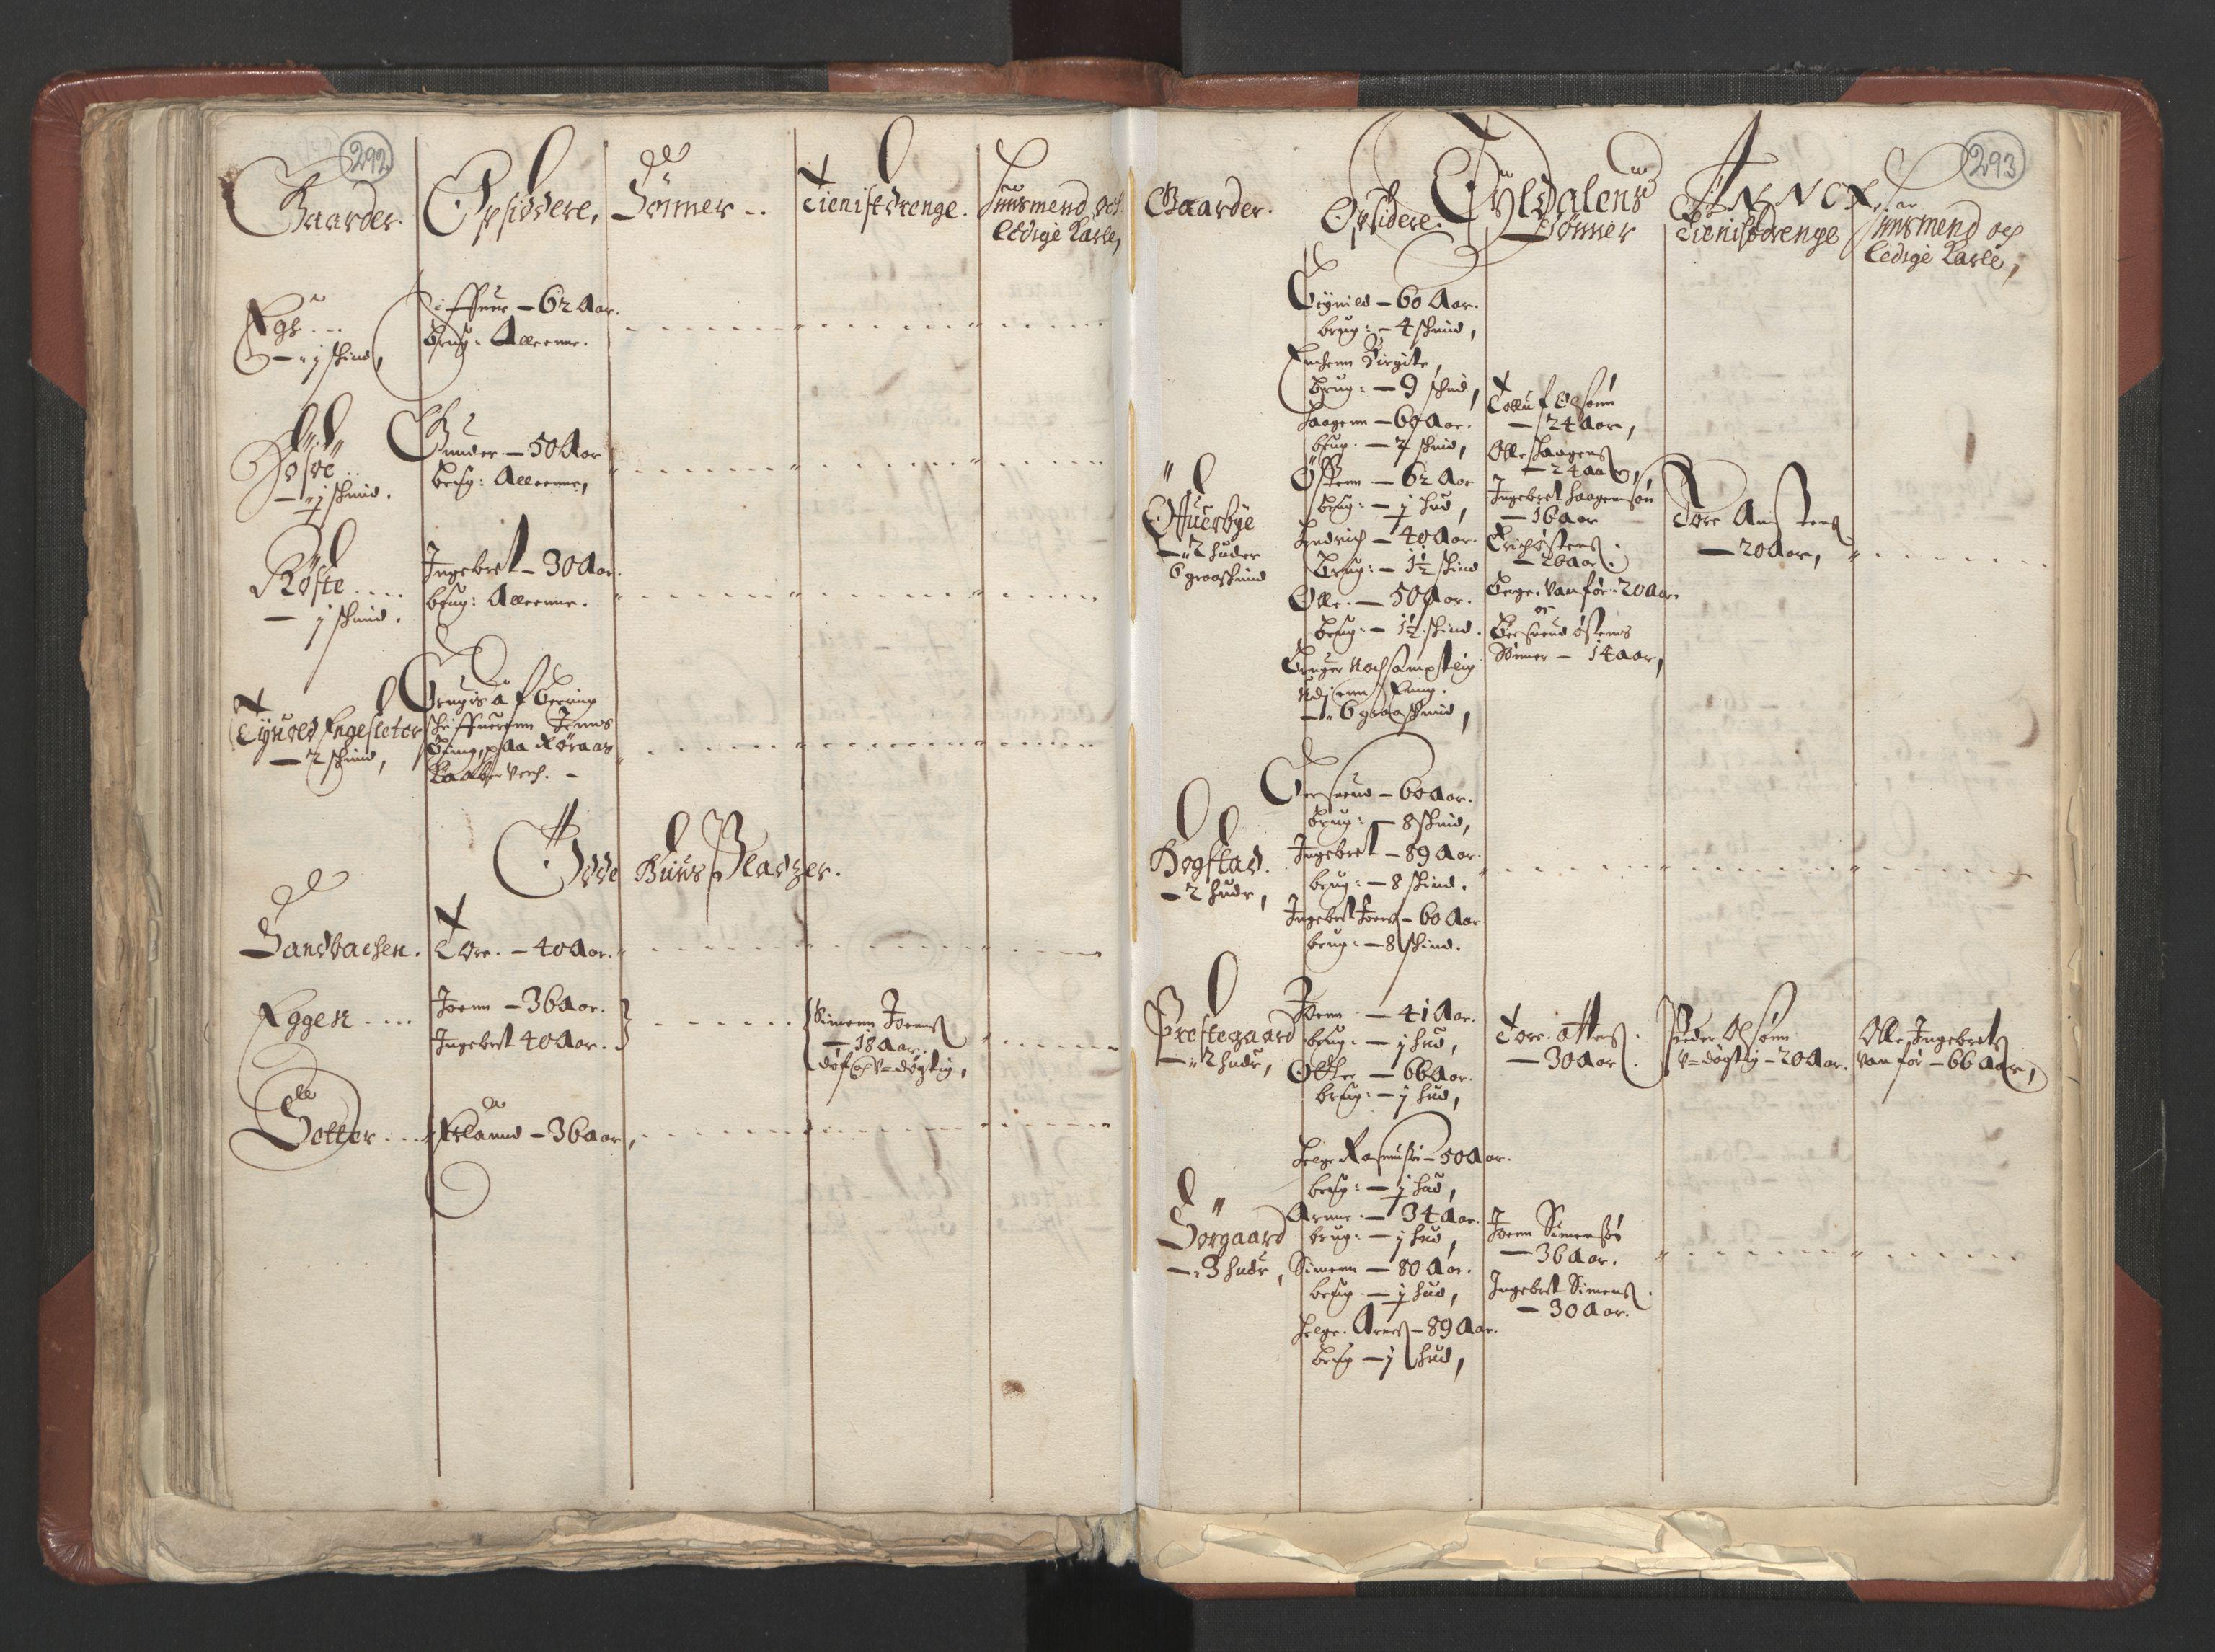 RA, Fogdenes og sorenskrivernes manntall 1664-1666, nr. 3: Hedmark fogderi og Solør, Østerdal og Odal fogderi, 1664, s. 292-293